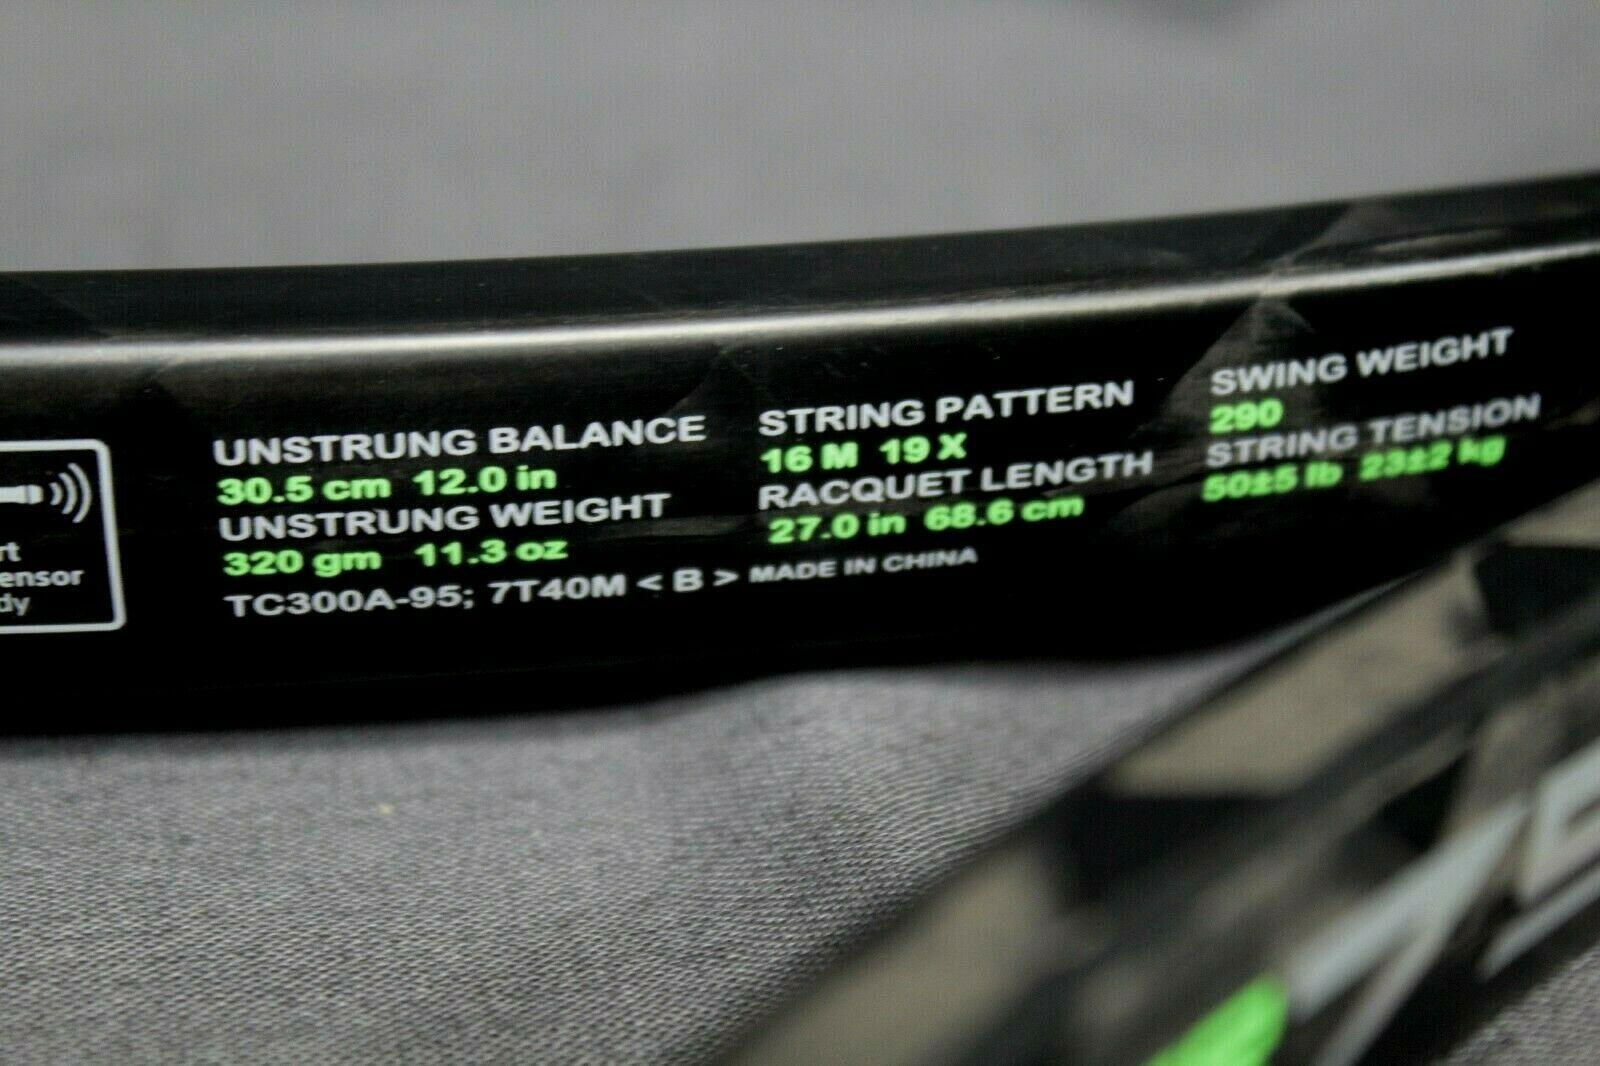 NEW Prince Textreme Tour 95 2015 Tennis Racquet 4 1/4 Strung